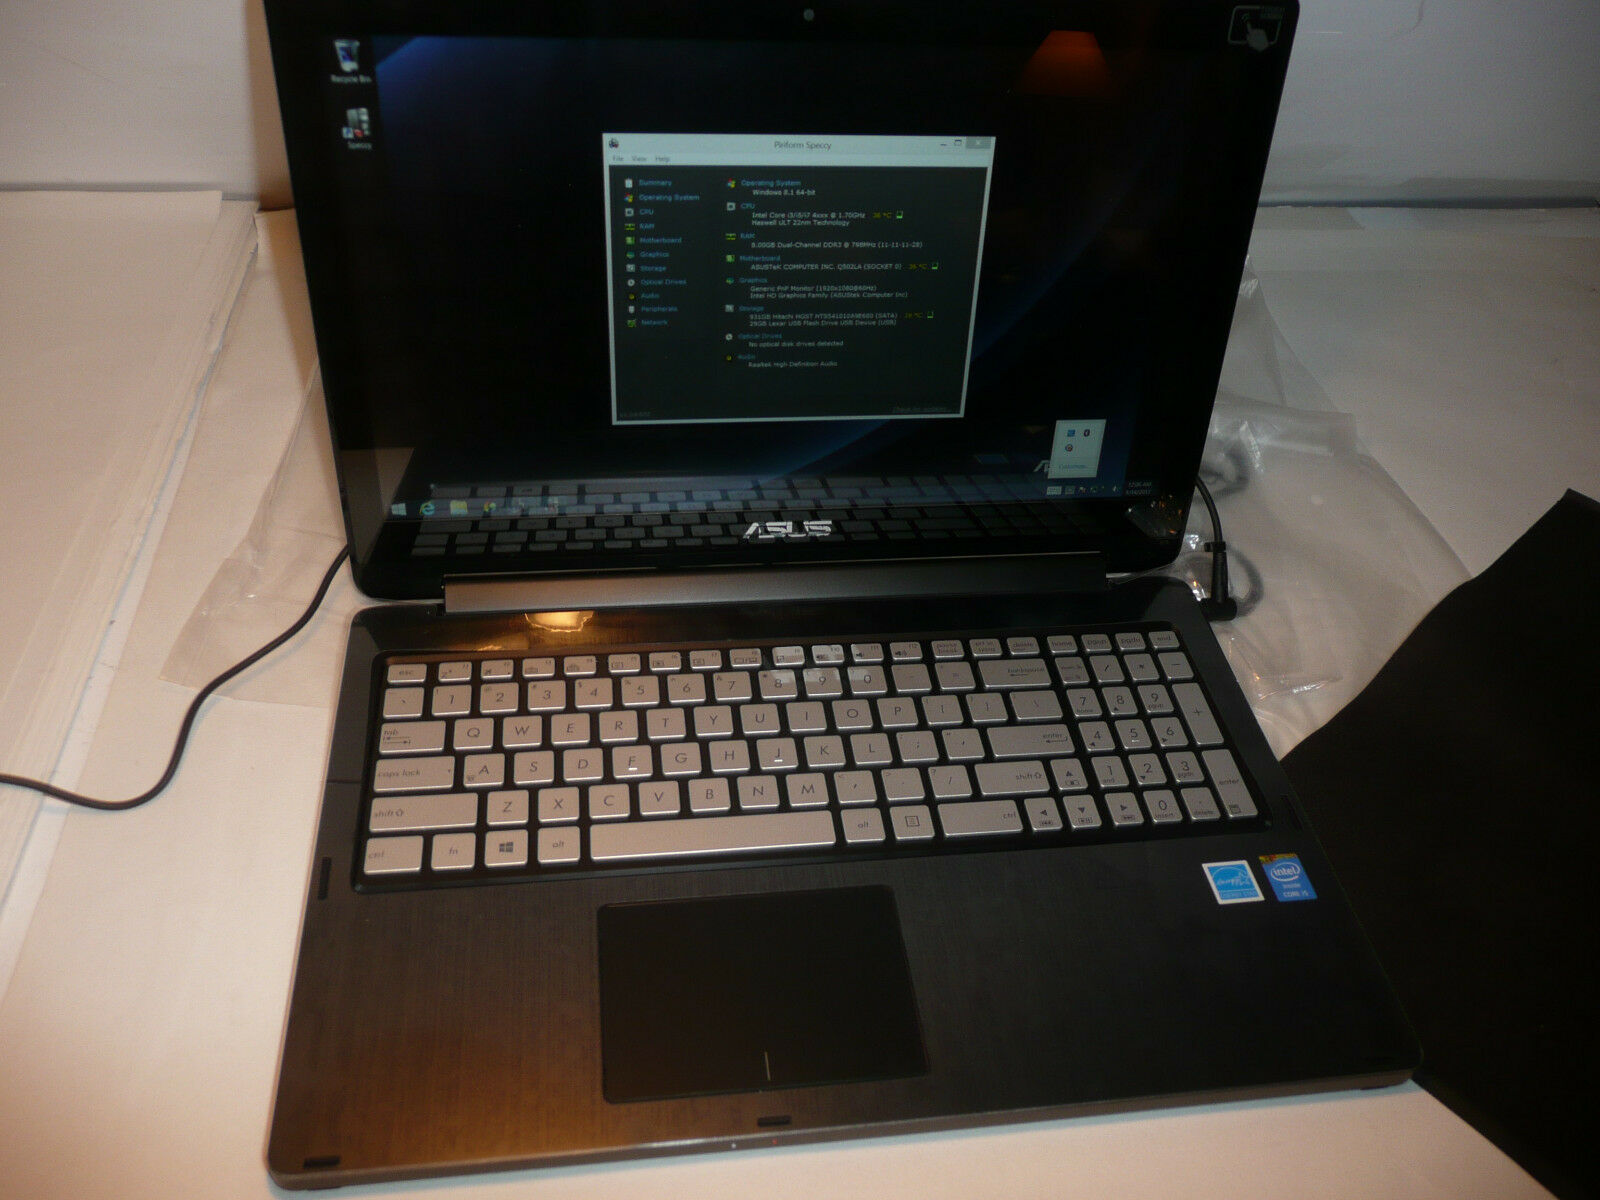 ASUS Q501LA 15.6in. (1TB, Intel Core i5 4th Gen., 1.7GHz, 8GB) Notebook/Laptop